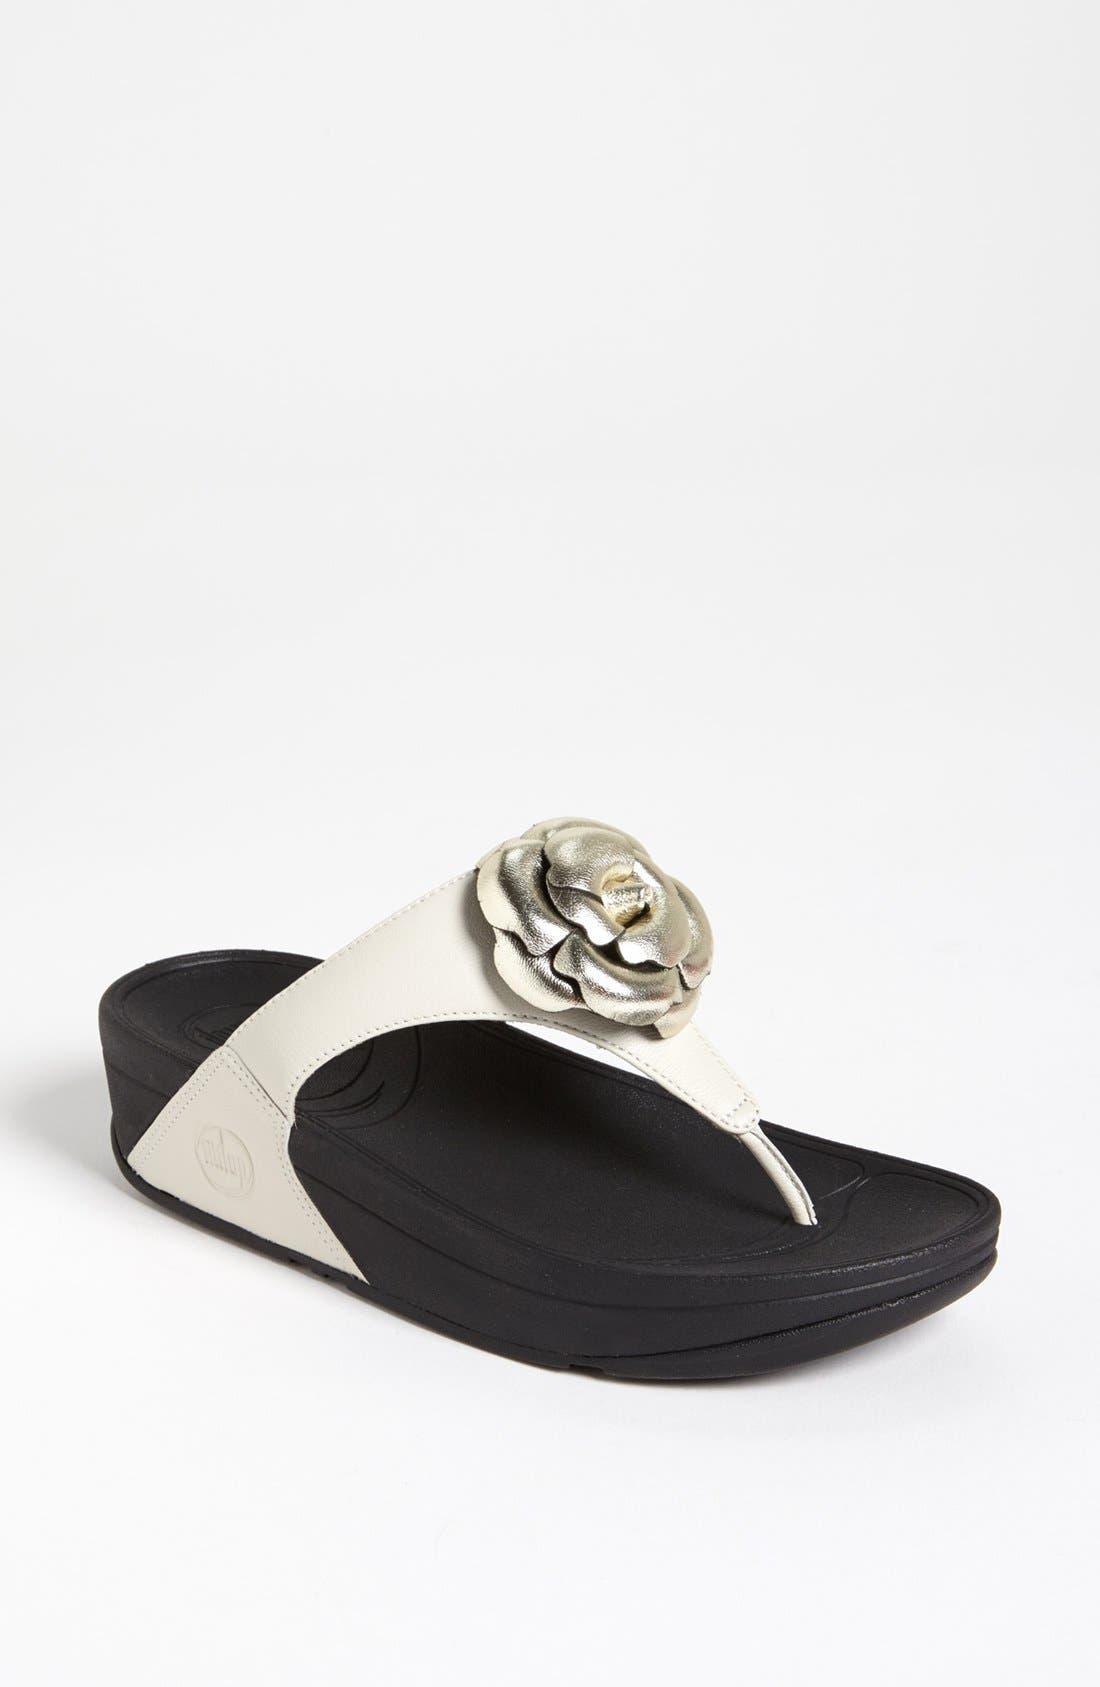 Main Image - FitFlop 'Florent' Sandal